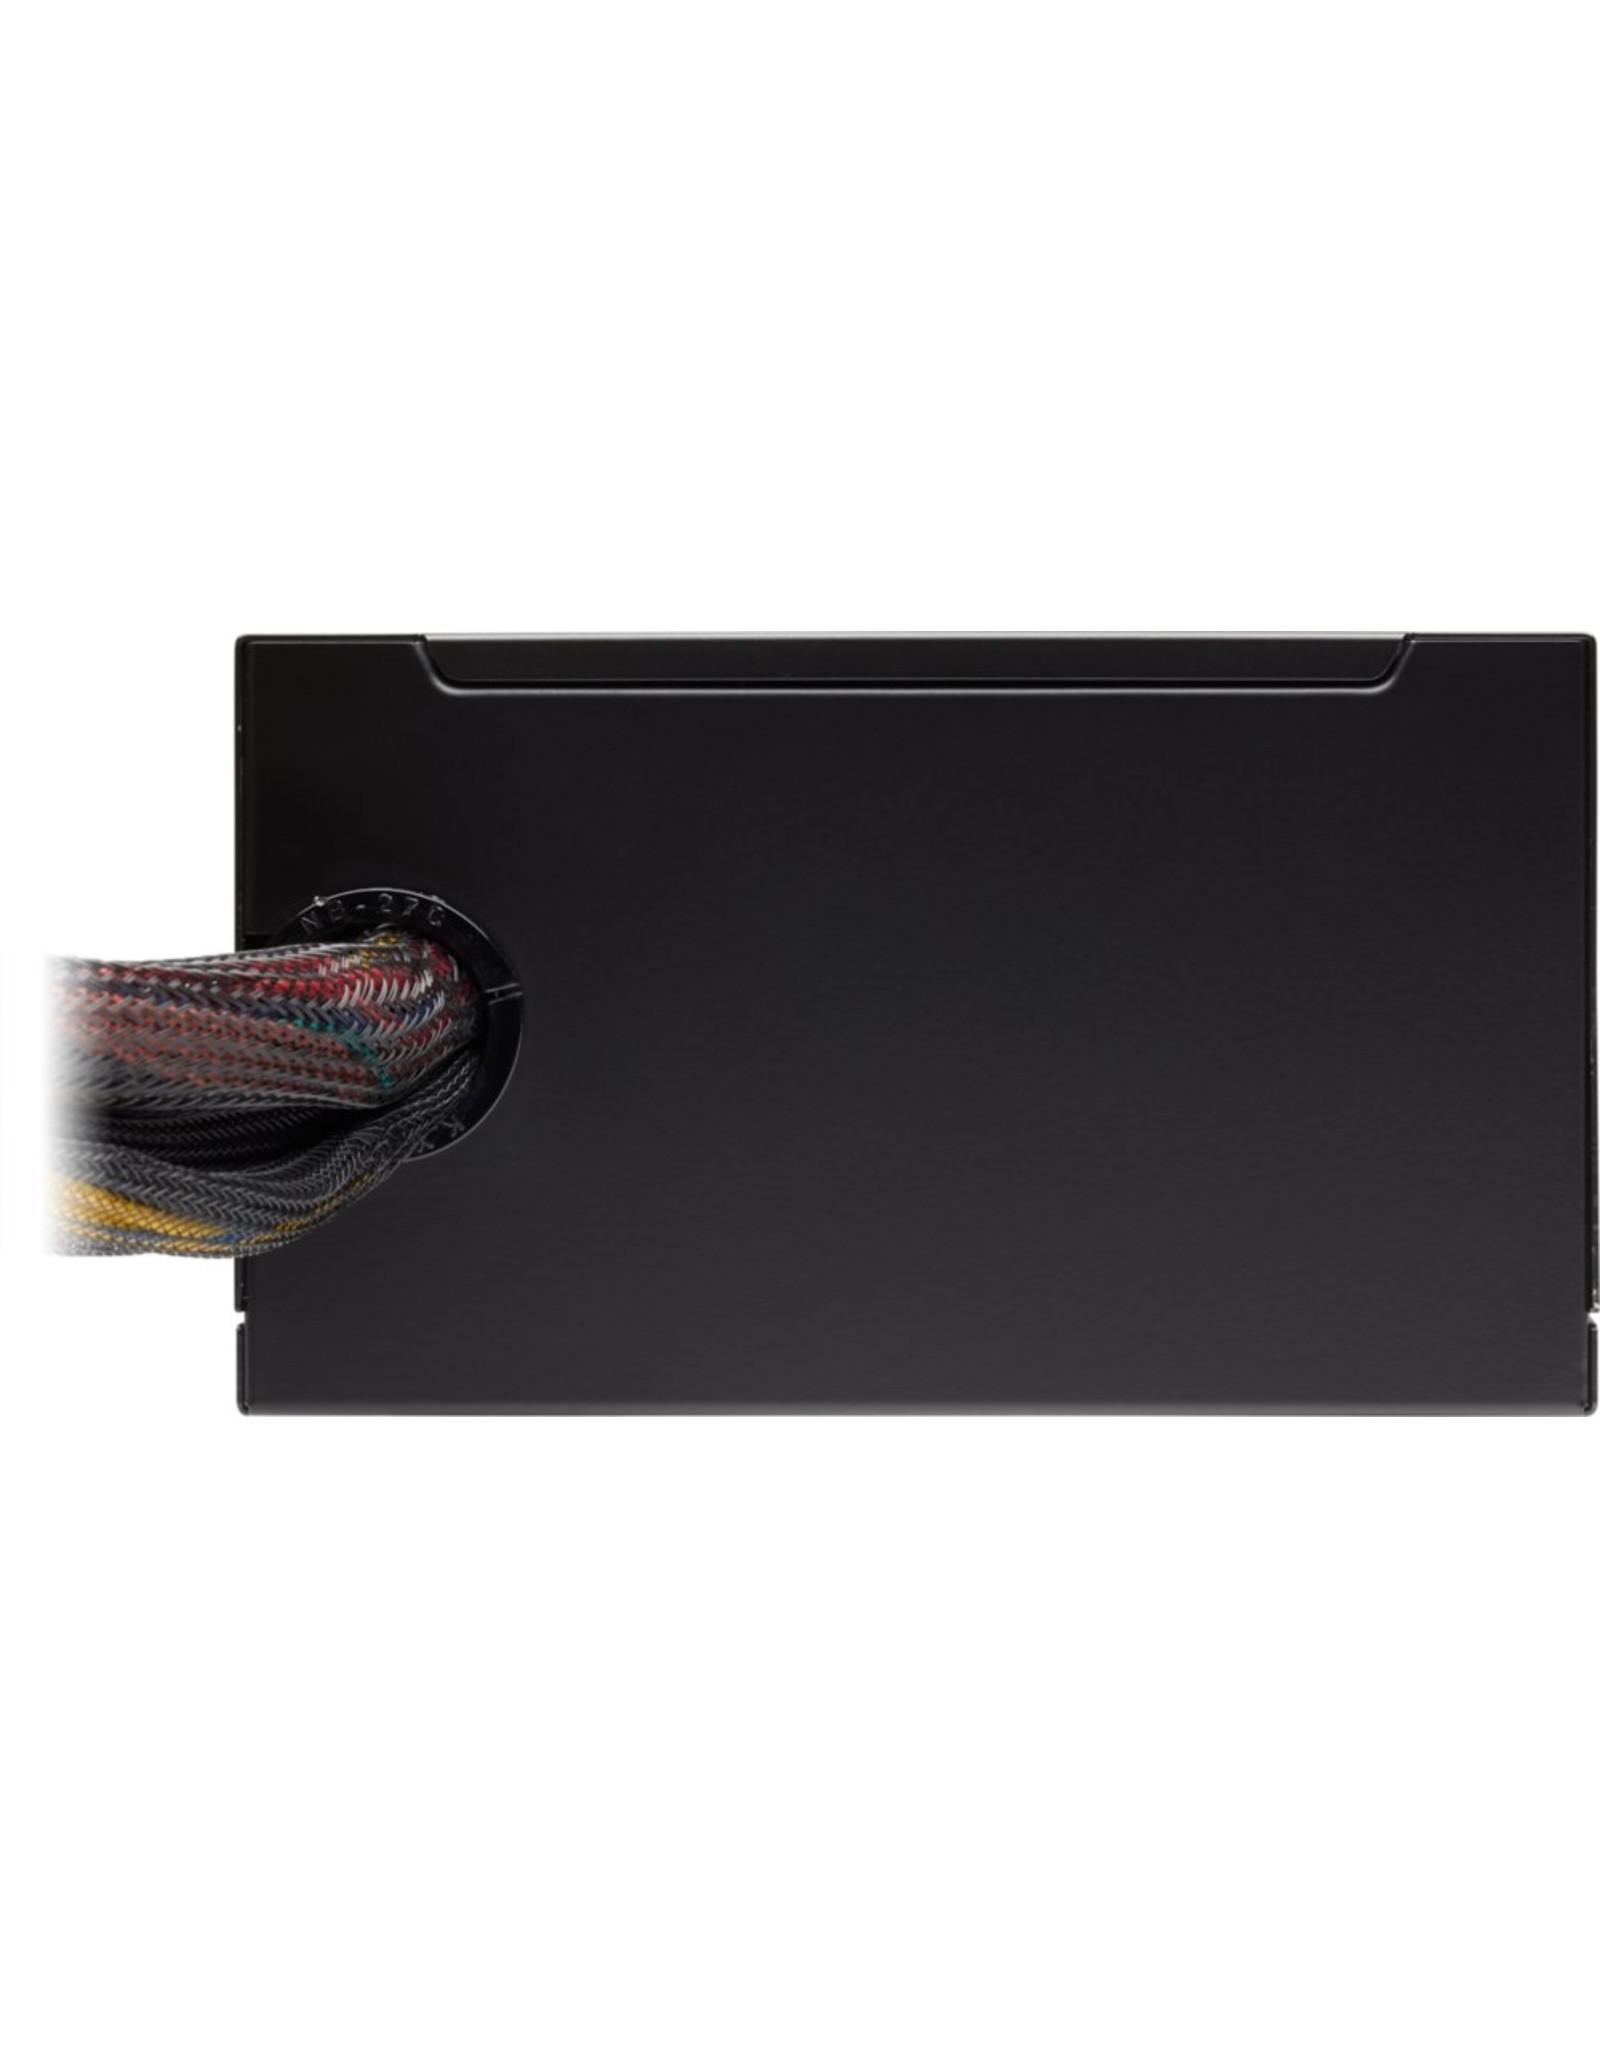 Corsair PSU  CV650 650W 80Plus (2020)